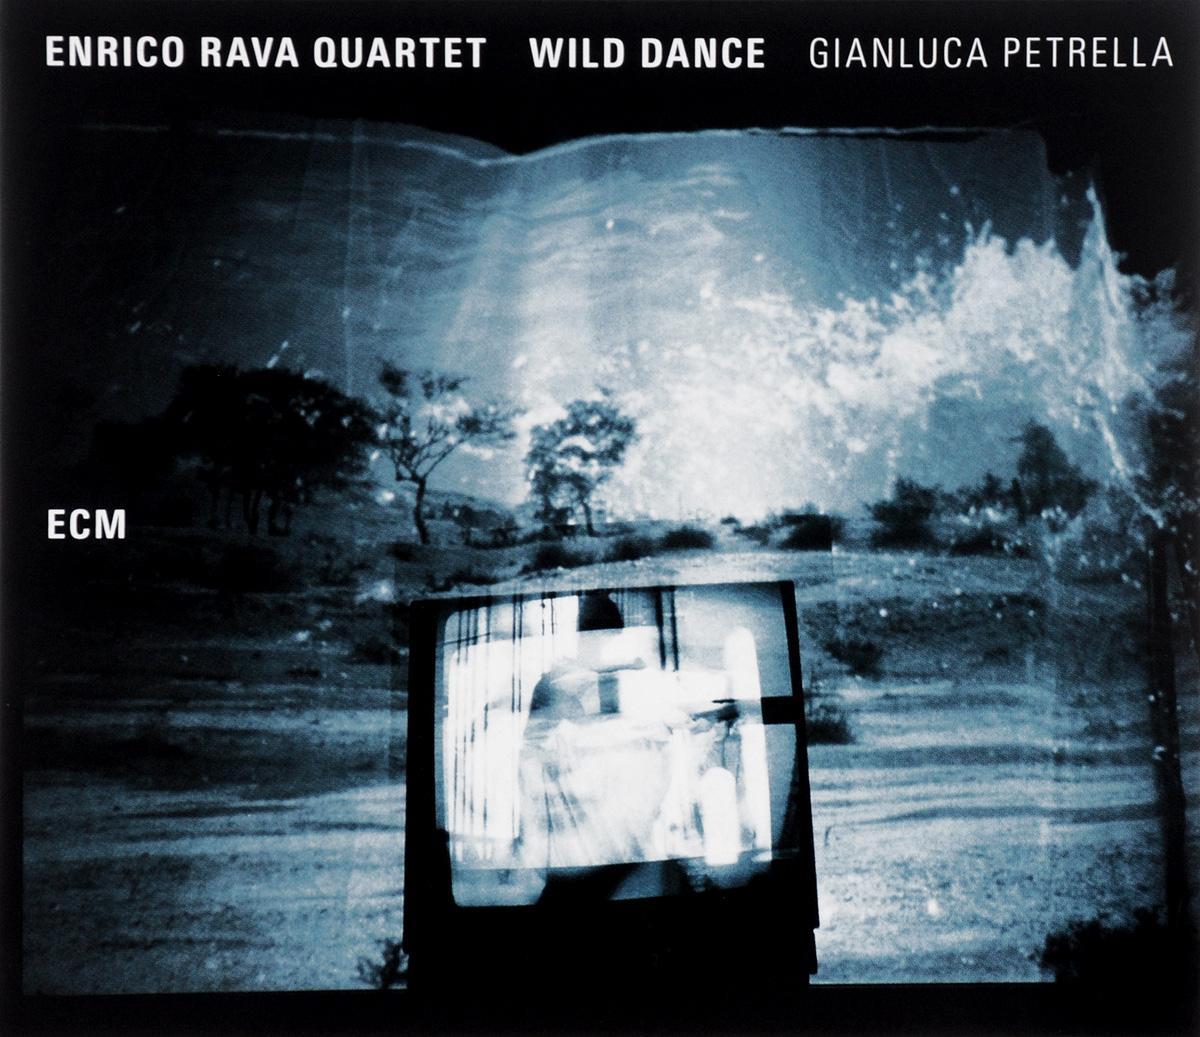 Жанлюка Петрелла,Enrico Rava Quartet Enrico Rava Quartet, Gianluca Petrella. Wild Dance enrico giuseppe dapei donne